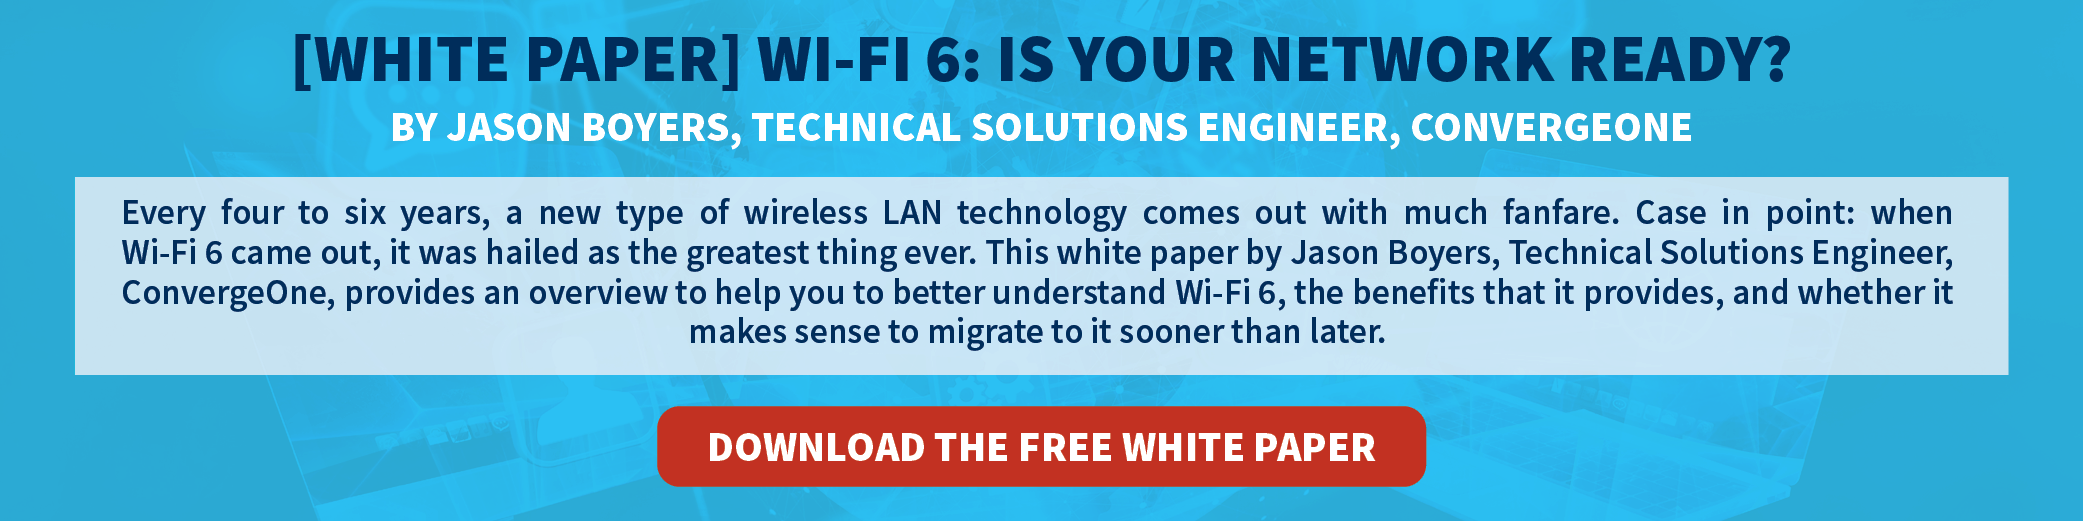 Wi-Fi 6 White Paper